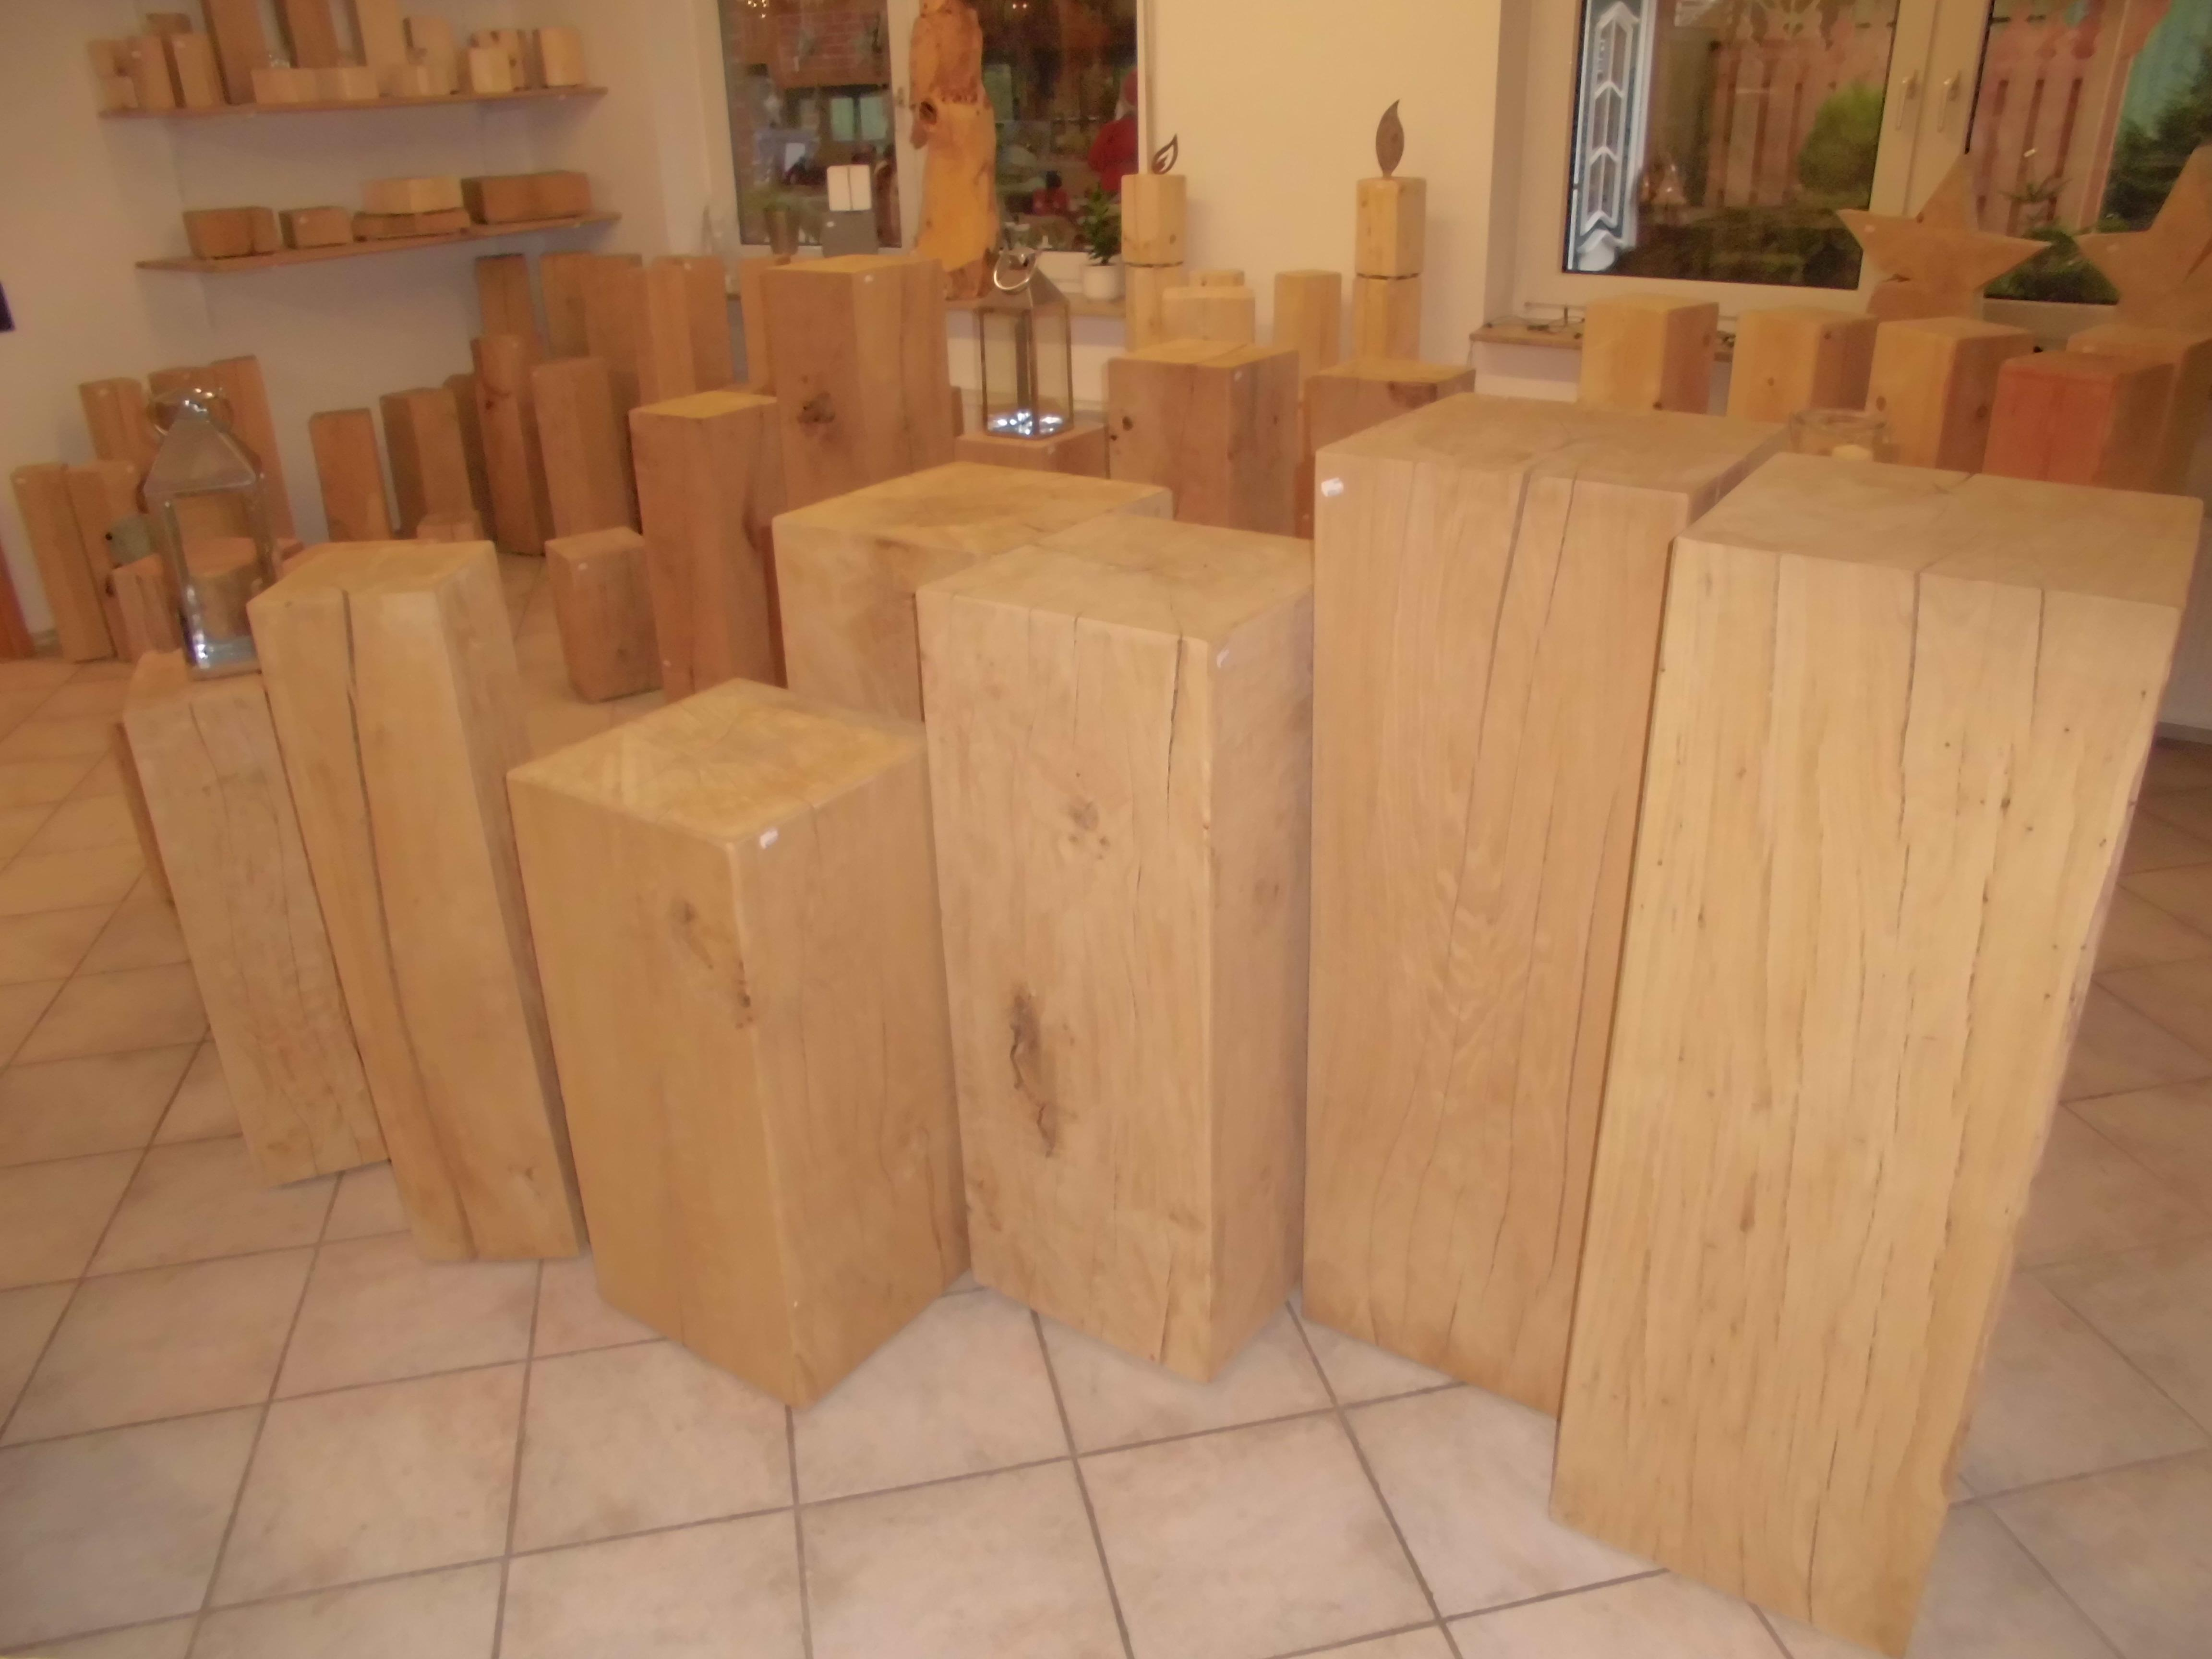 Eichenholzsäule gehobelt, geschliffen, angefast 30x30x40cm